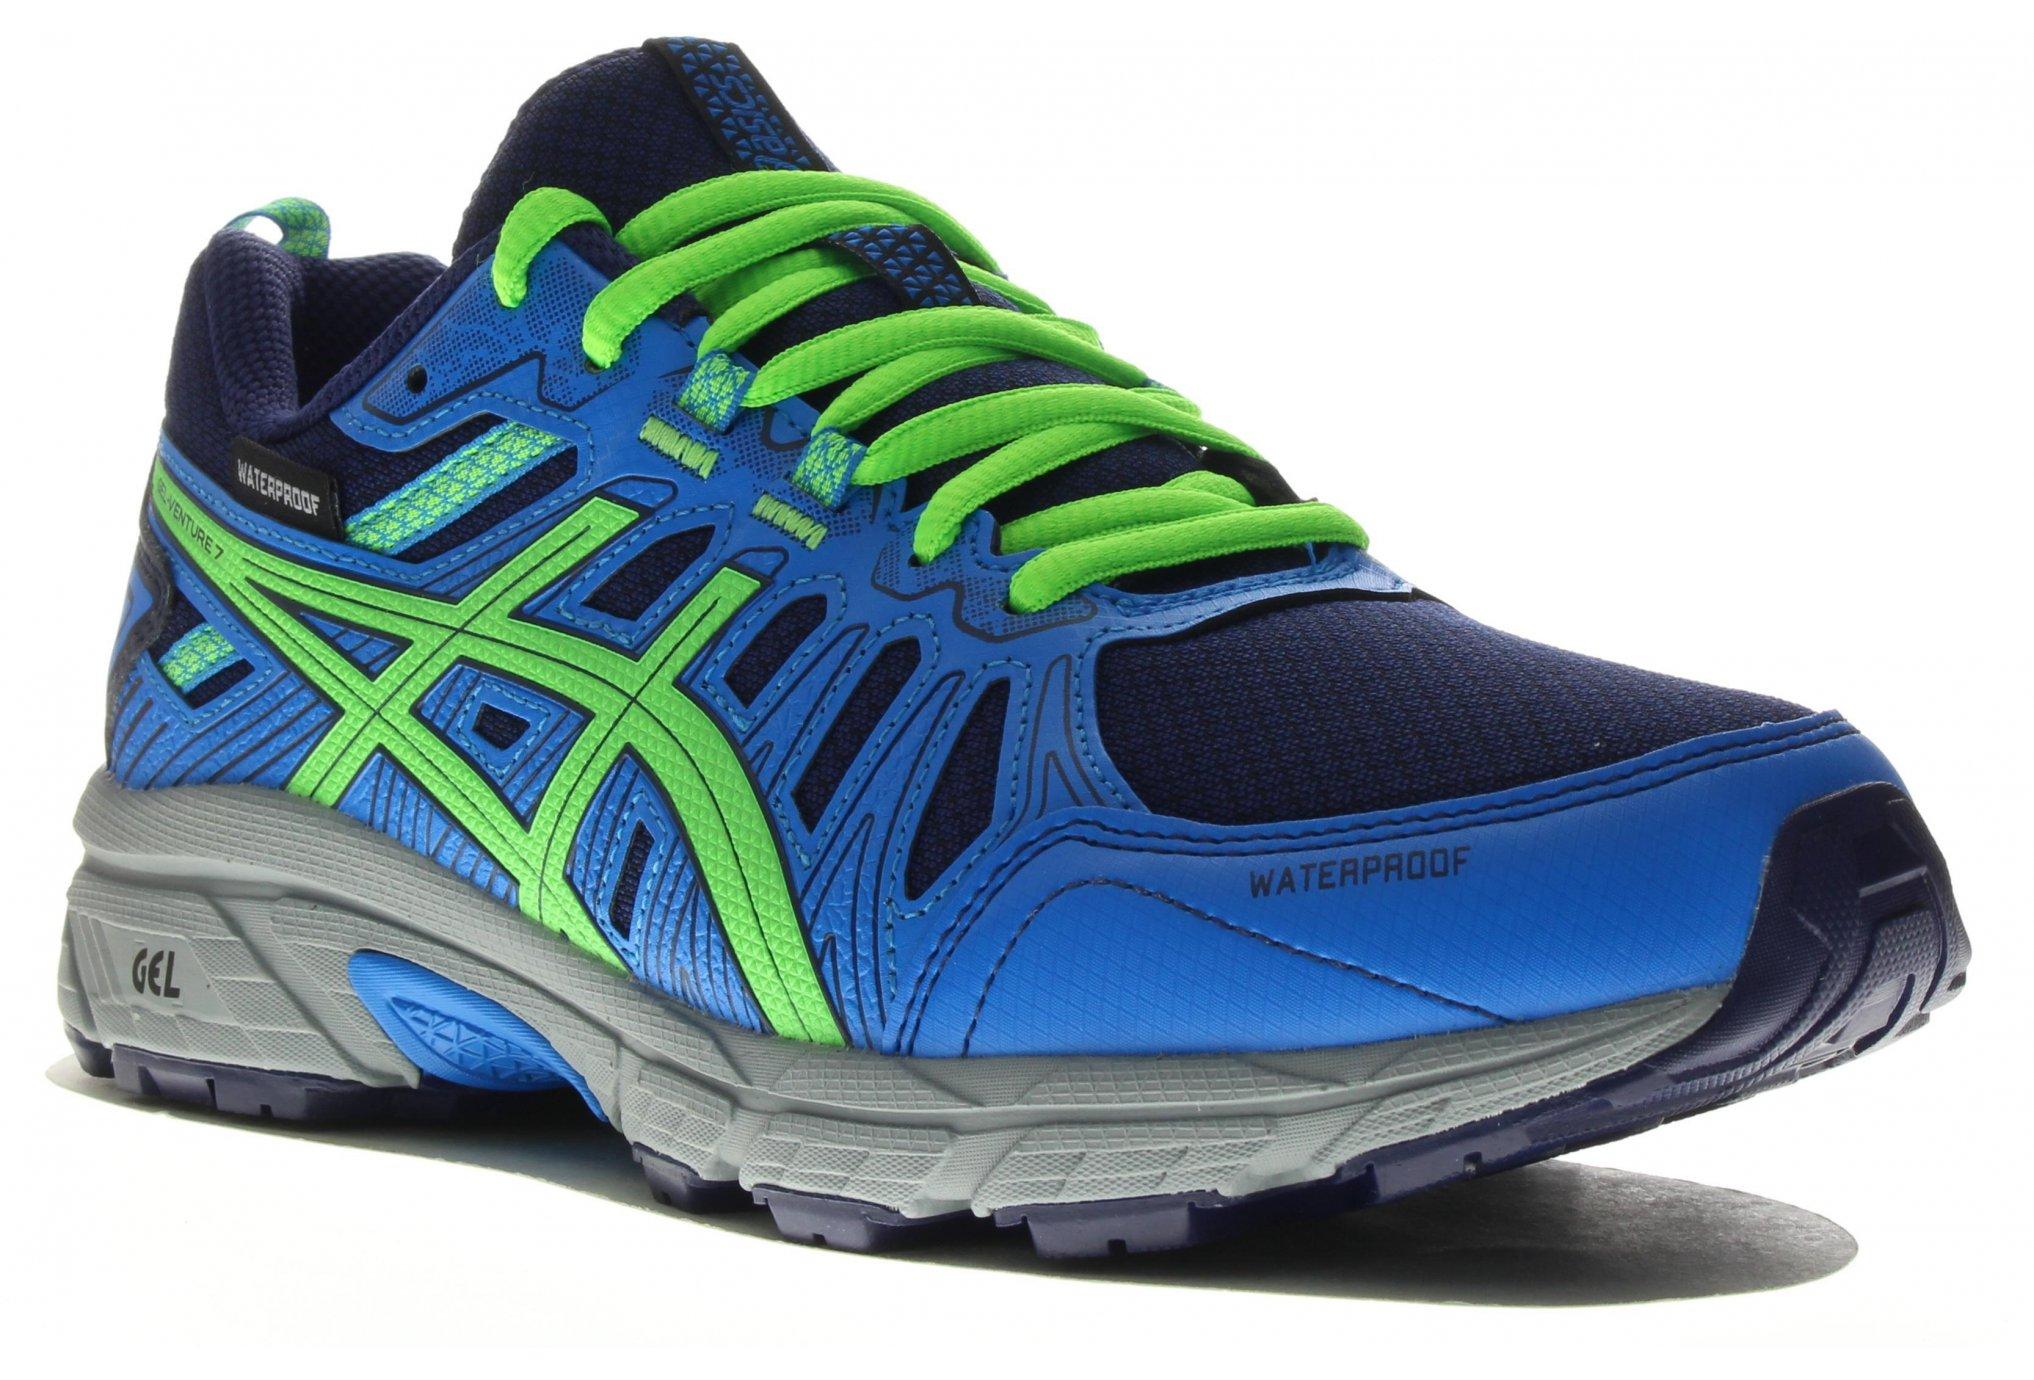 Asics Gel-Venture 7 WP GS Chaussures homme